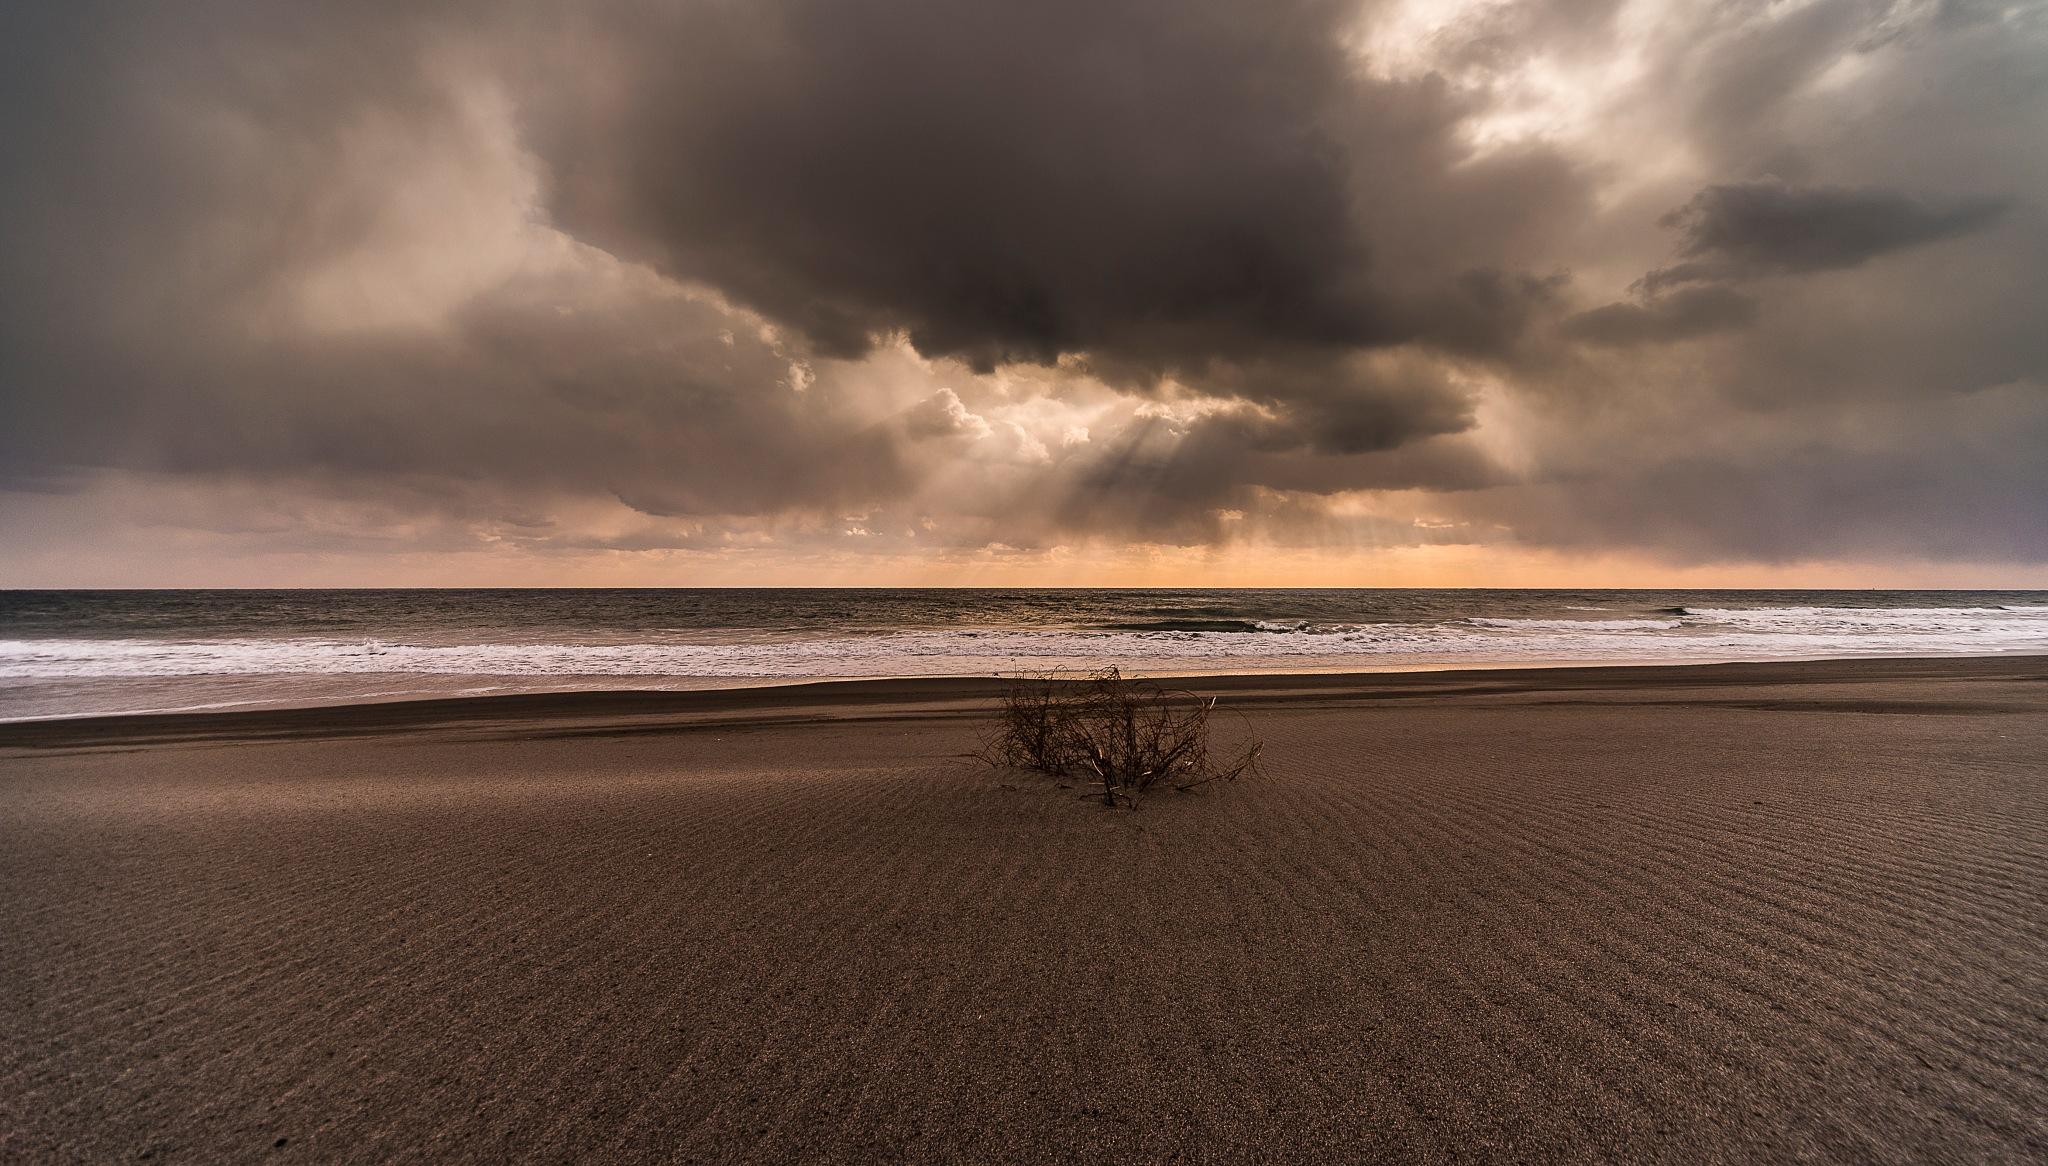 Winter seascape by Shozo kudo